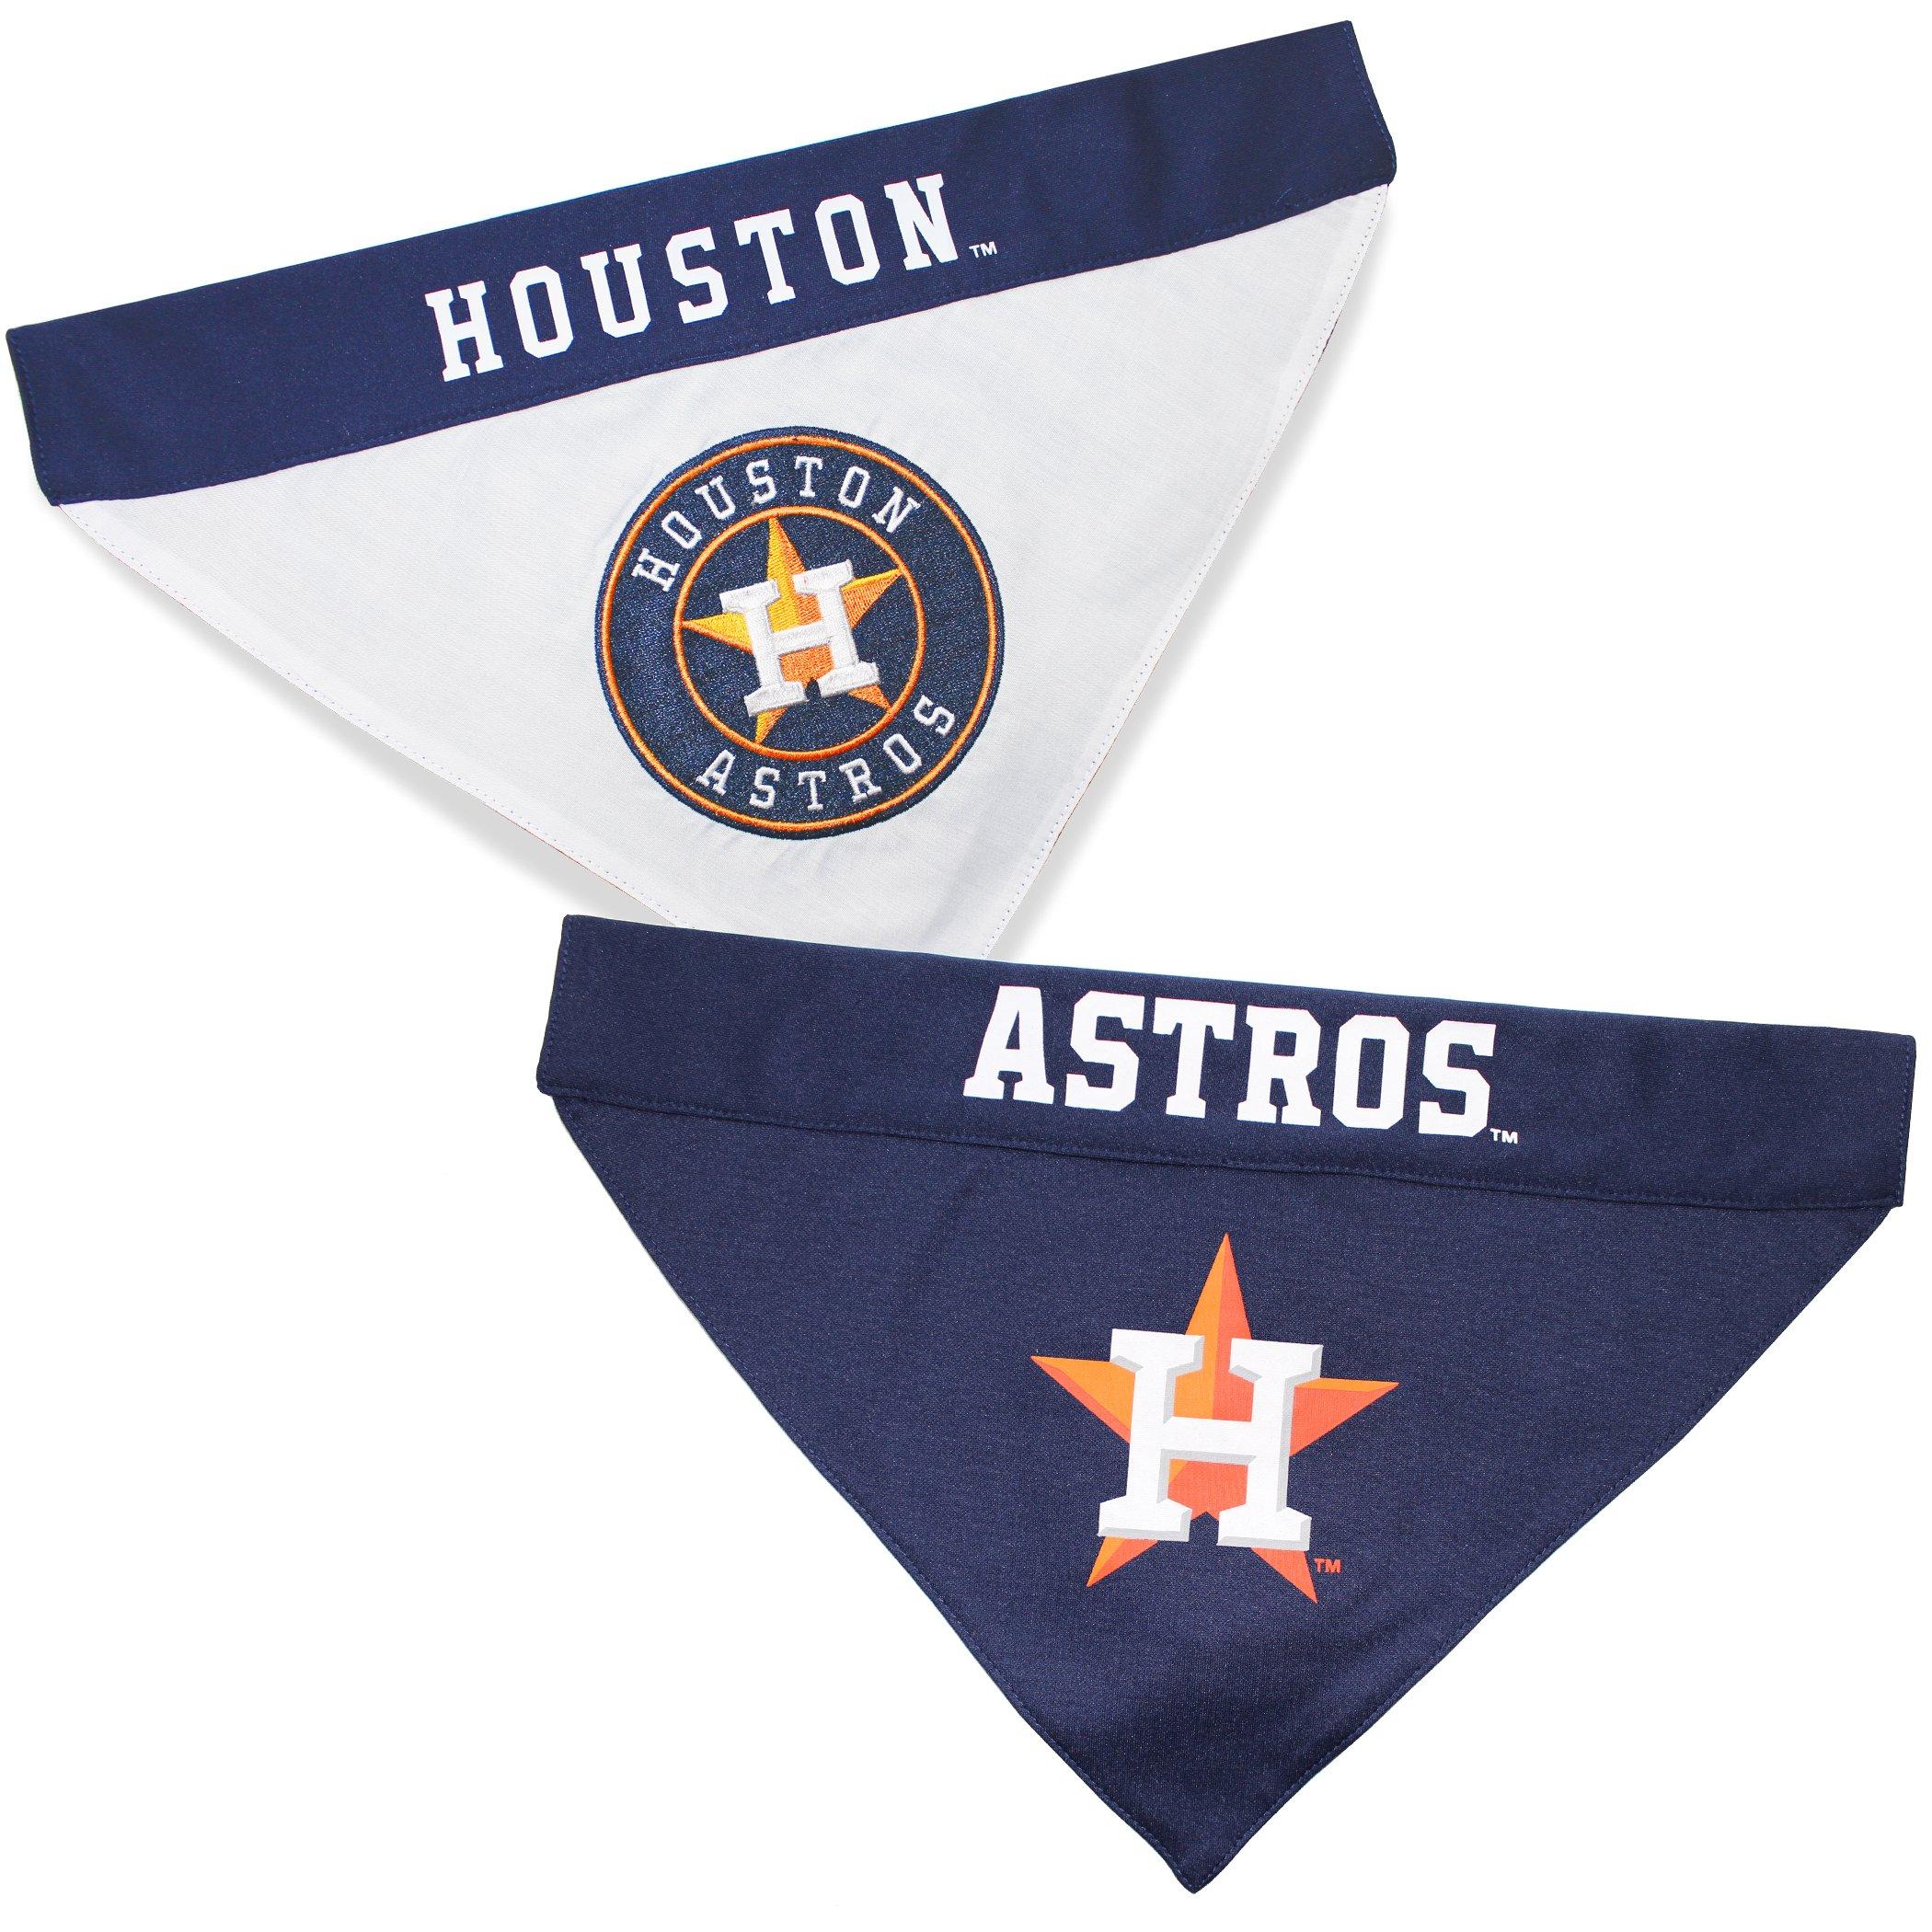 Pets First AST-3217-S-M MLB Dog Bandana - Houston Astros Reversible Pet Bandana, Small/Medium, MLB Team Color